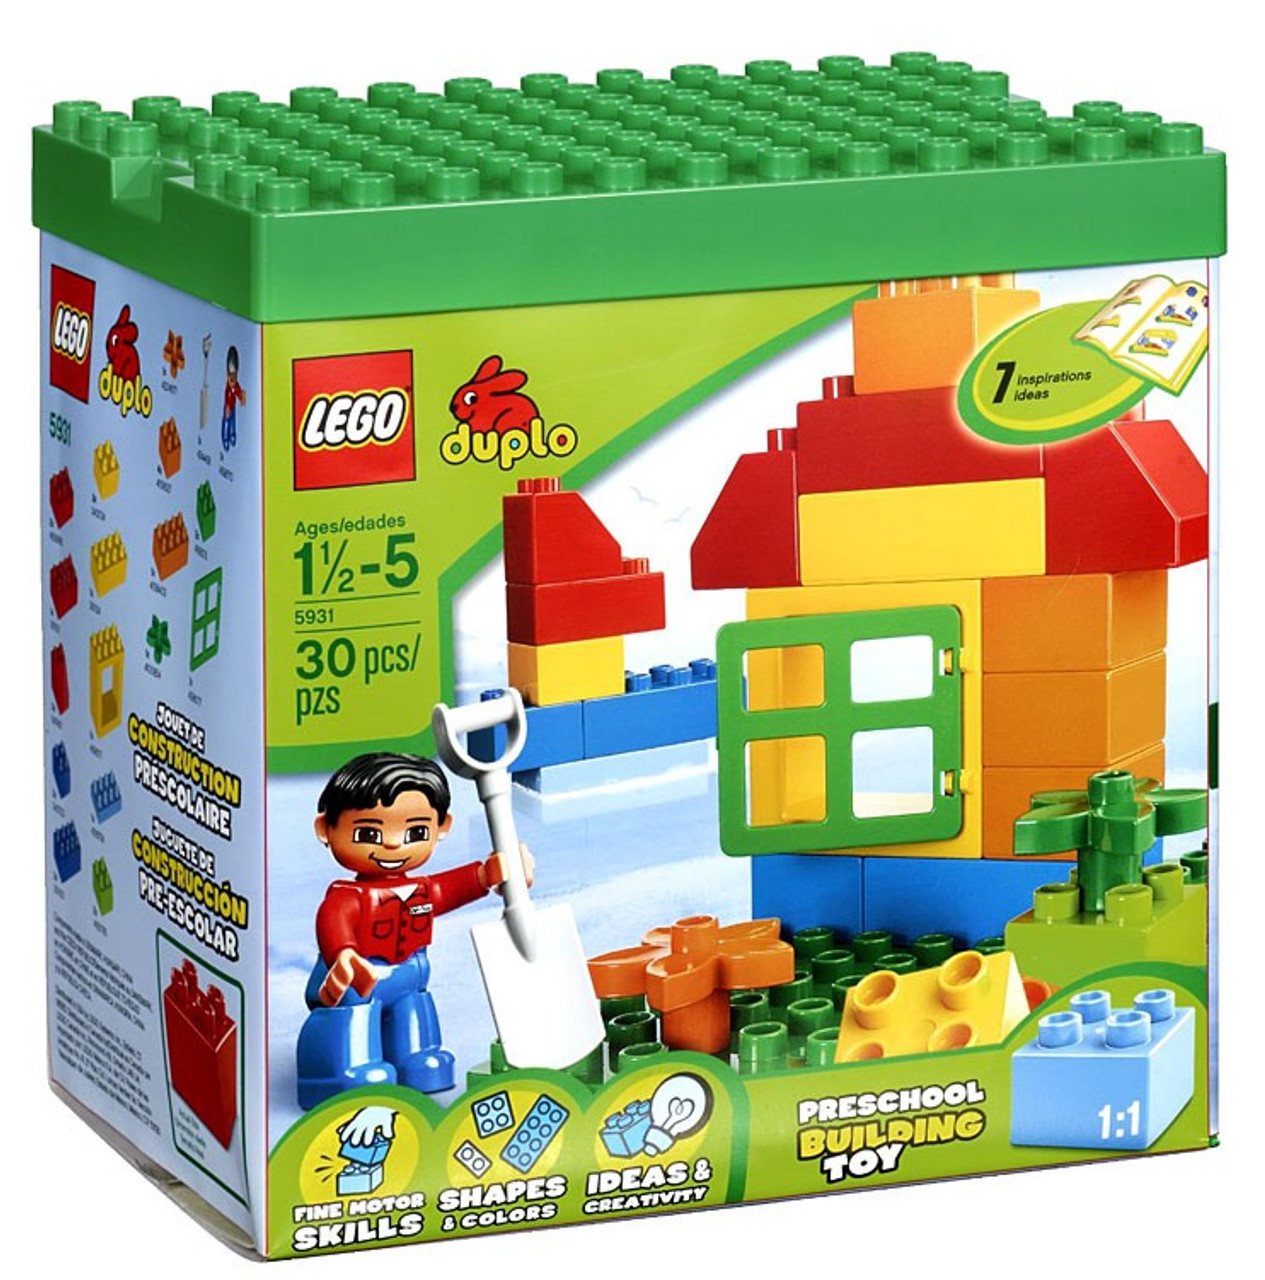 Lego Duplo My First Lego Duplo Set 5931 Toywiz